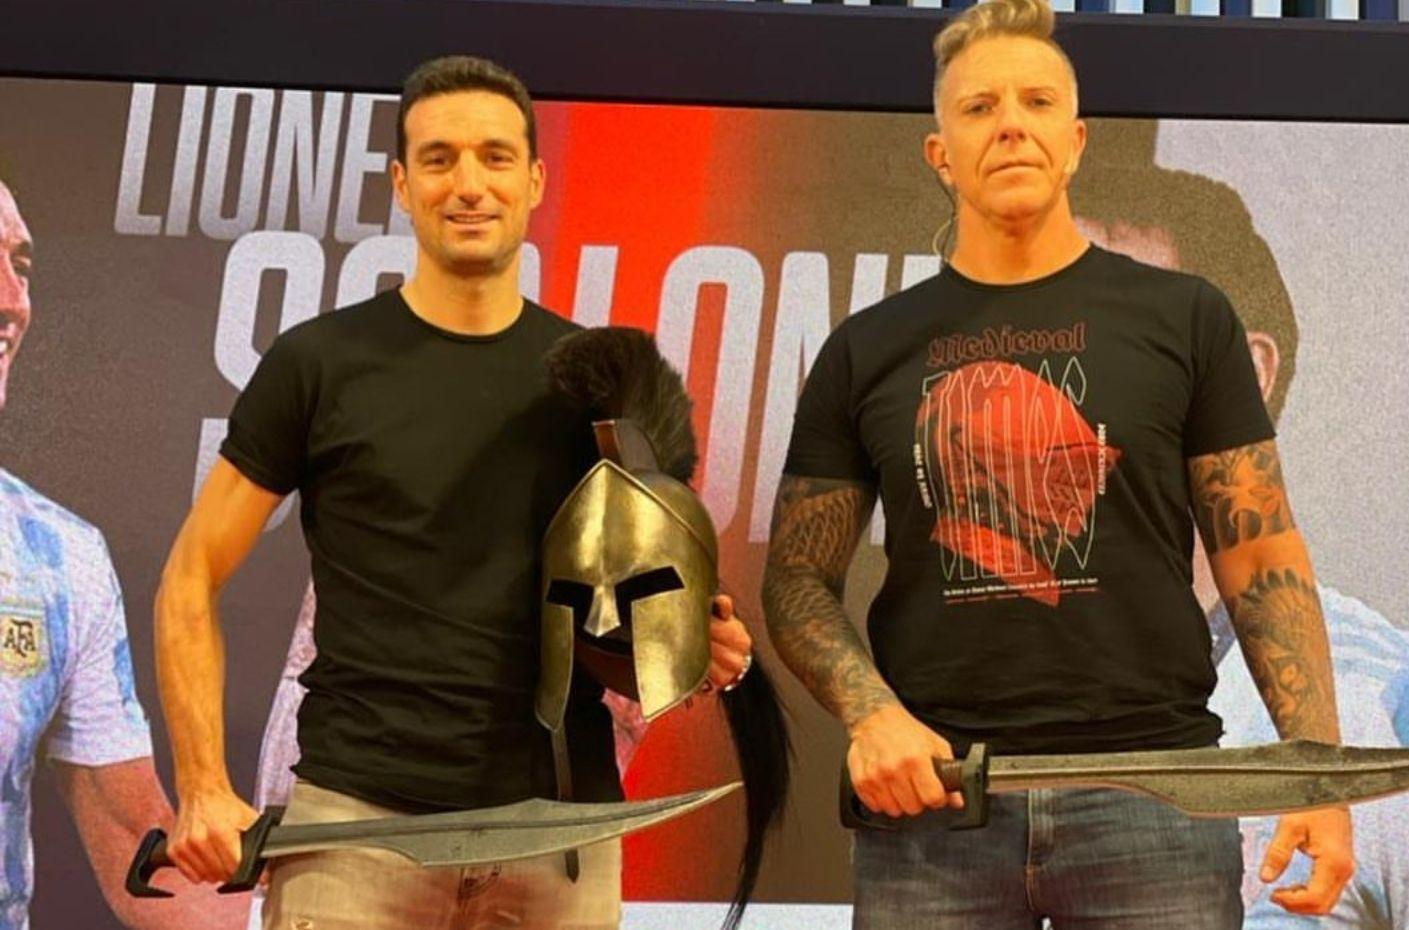 Momento lisérgico de la entrevista de Alejandro Fantino a Lionel Scaloni, vestidos de espartanos